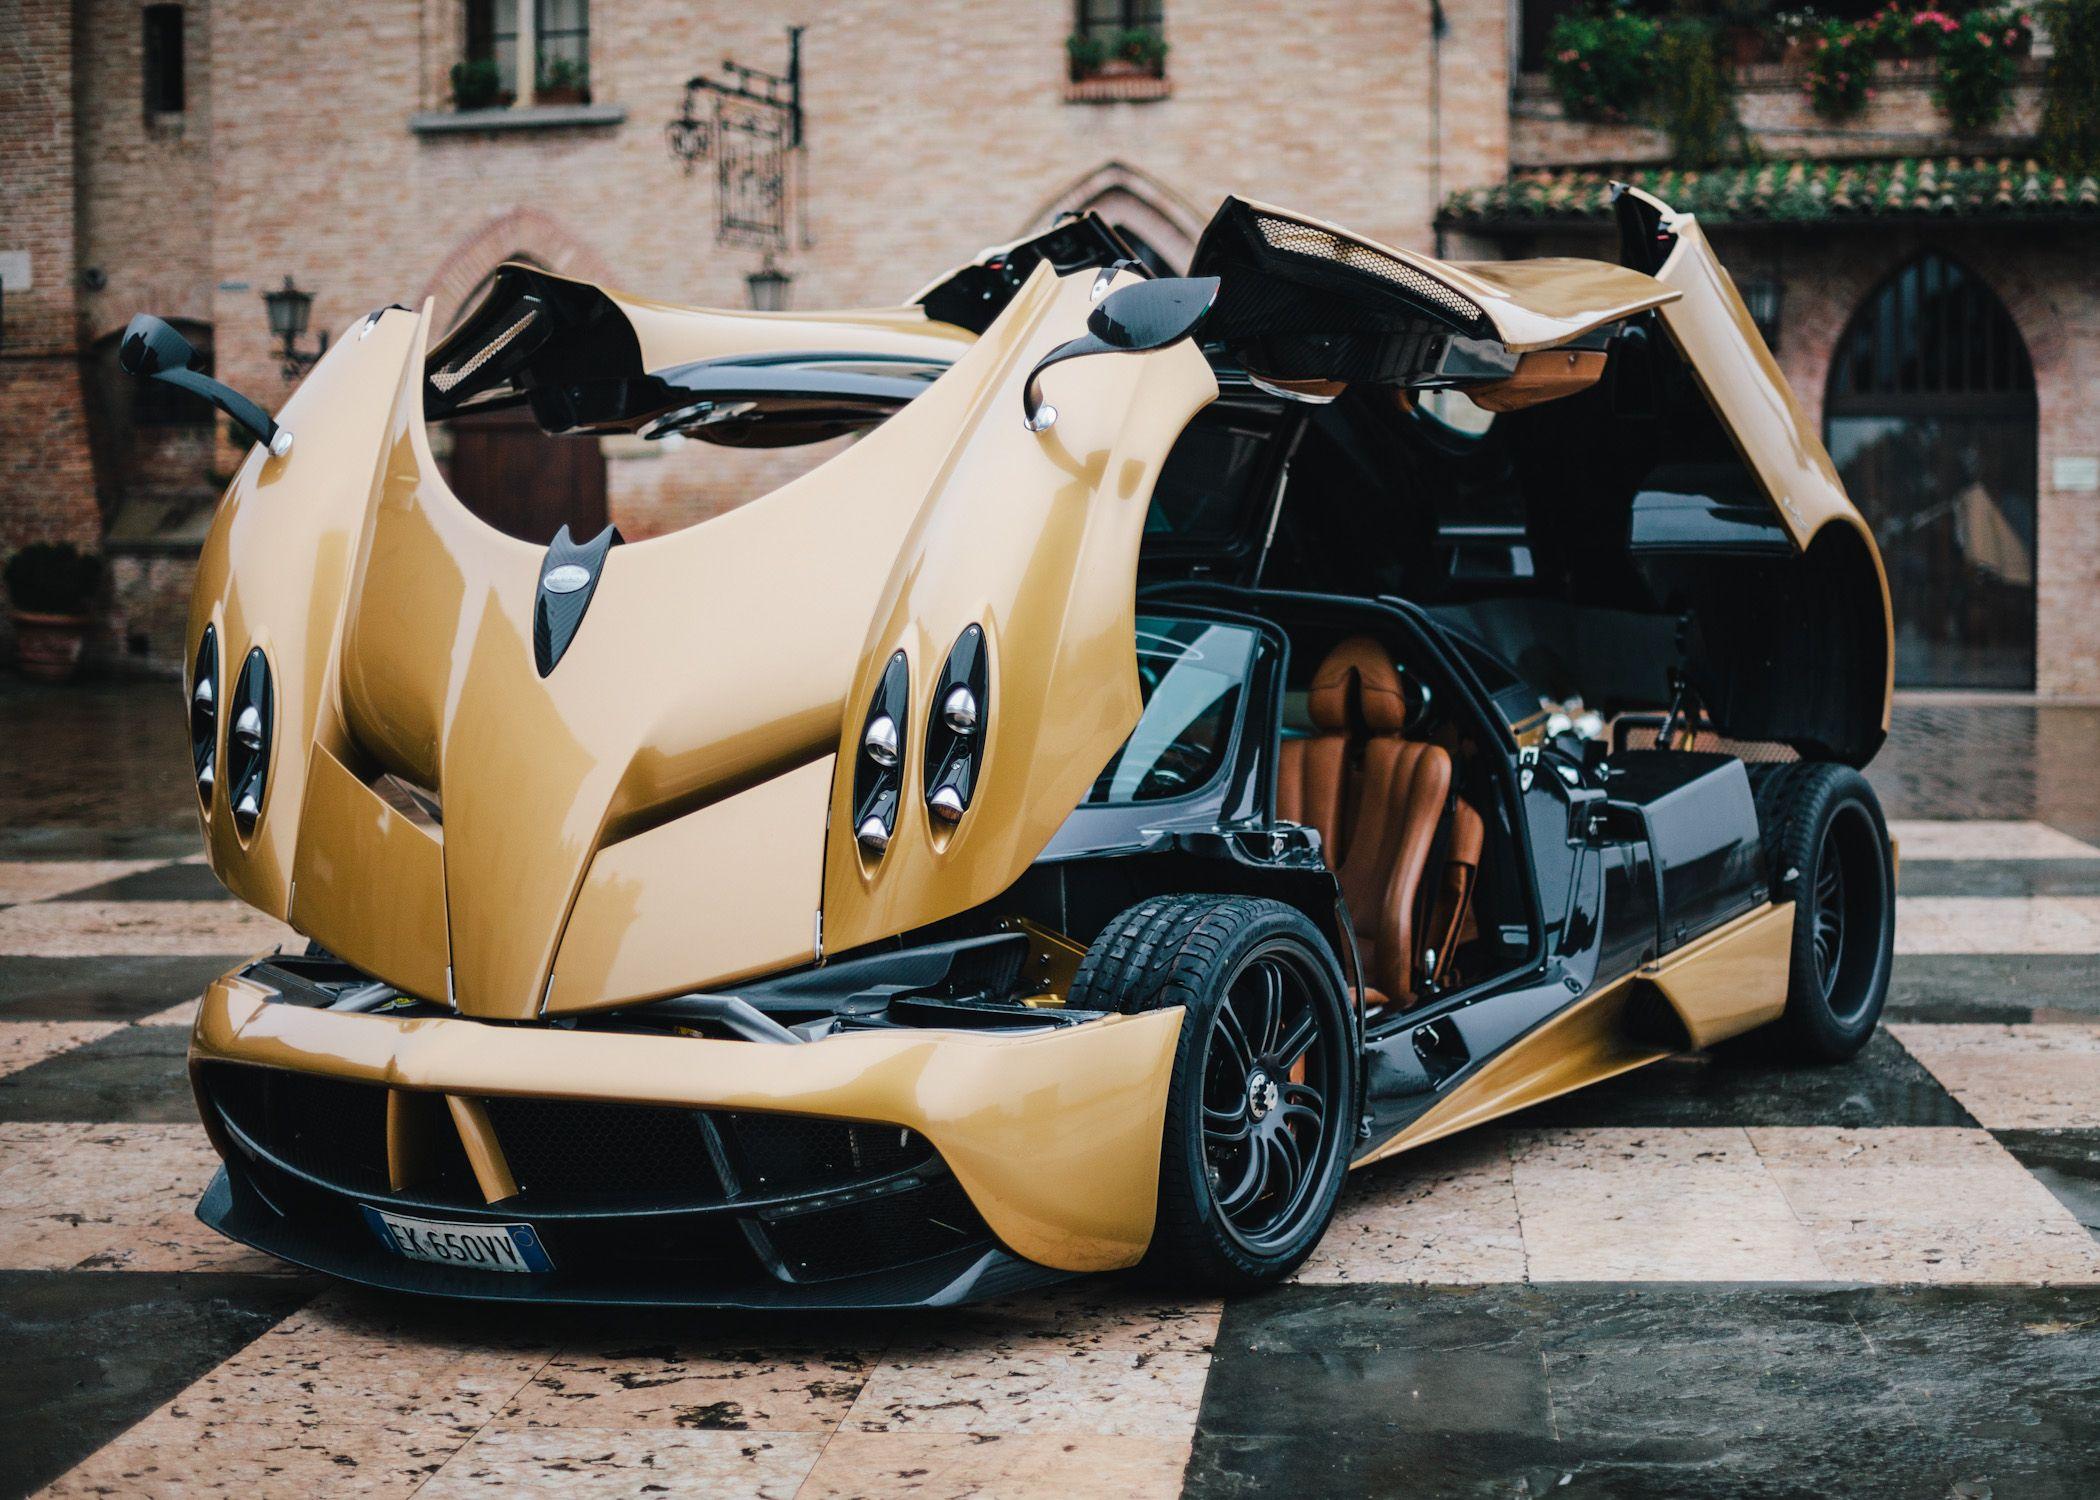 Pagani Huayra Hands On With Pagani S Latest Hypercar Don T Mess